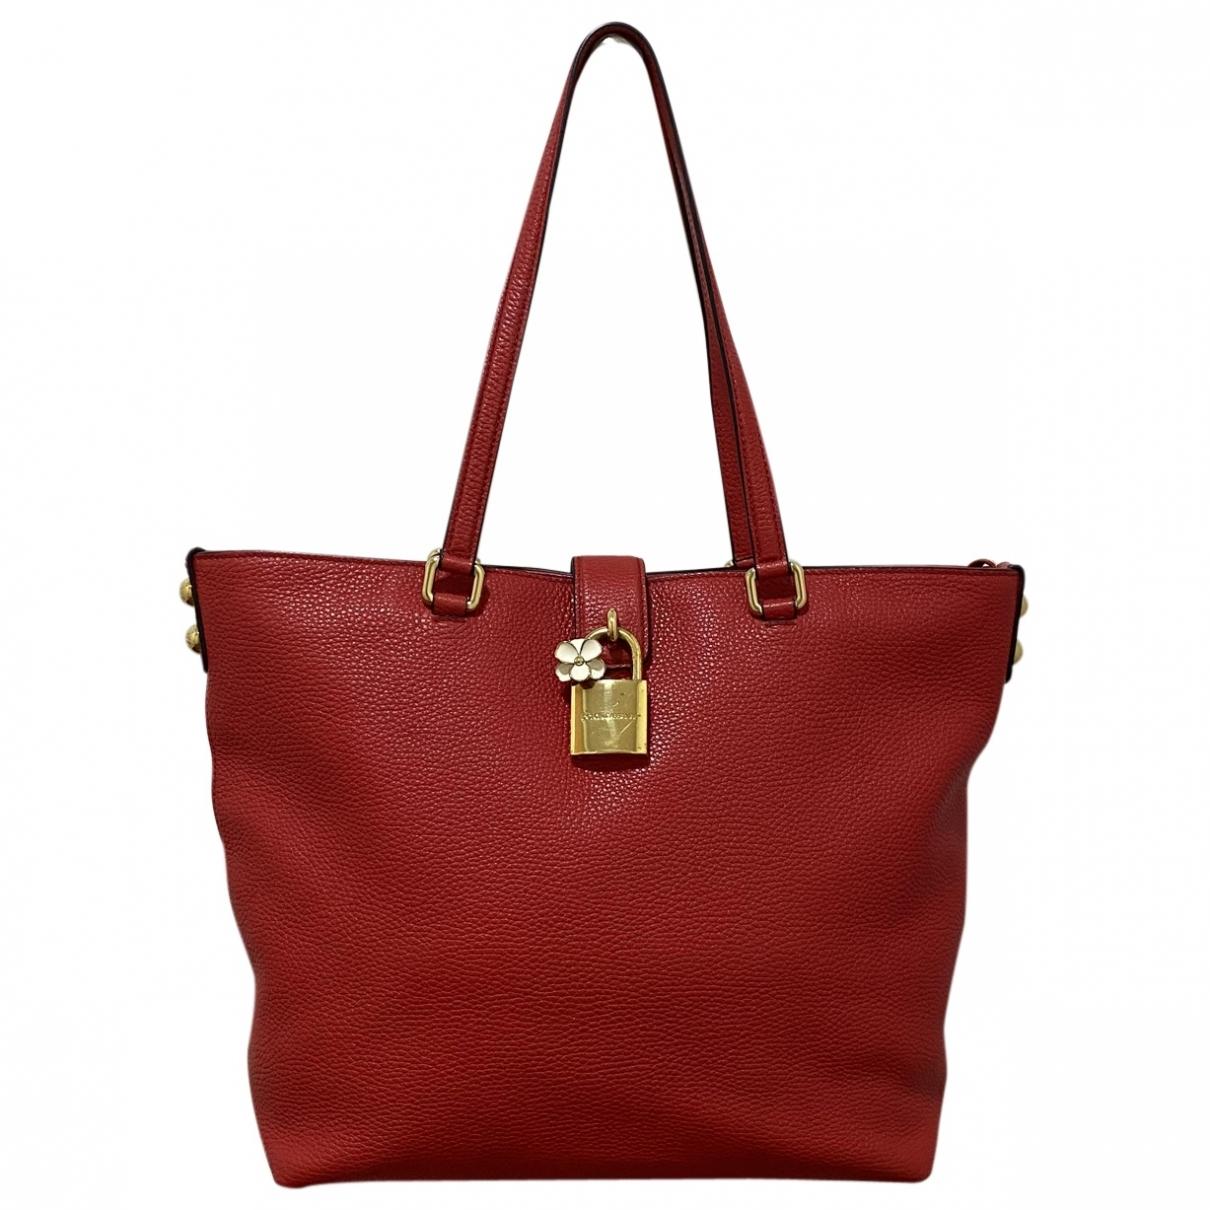 Dolce & Gabbana - Sac a main   pour femme en cuir - rouge